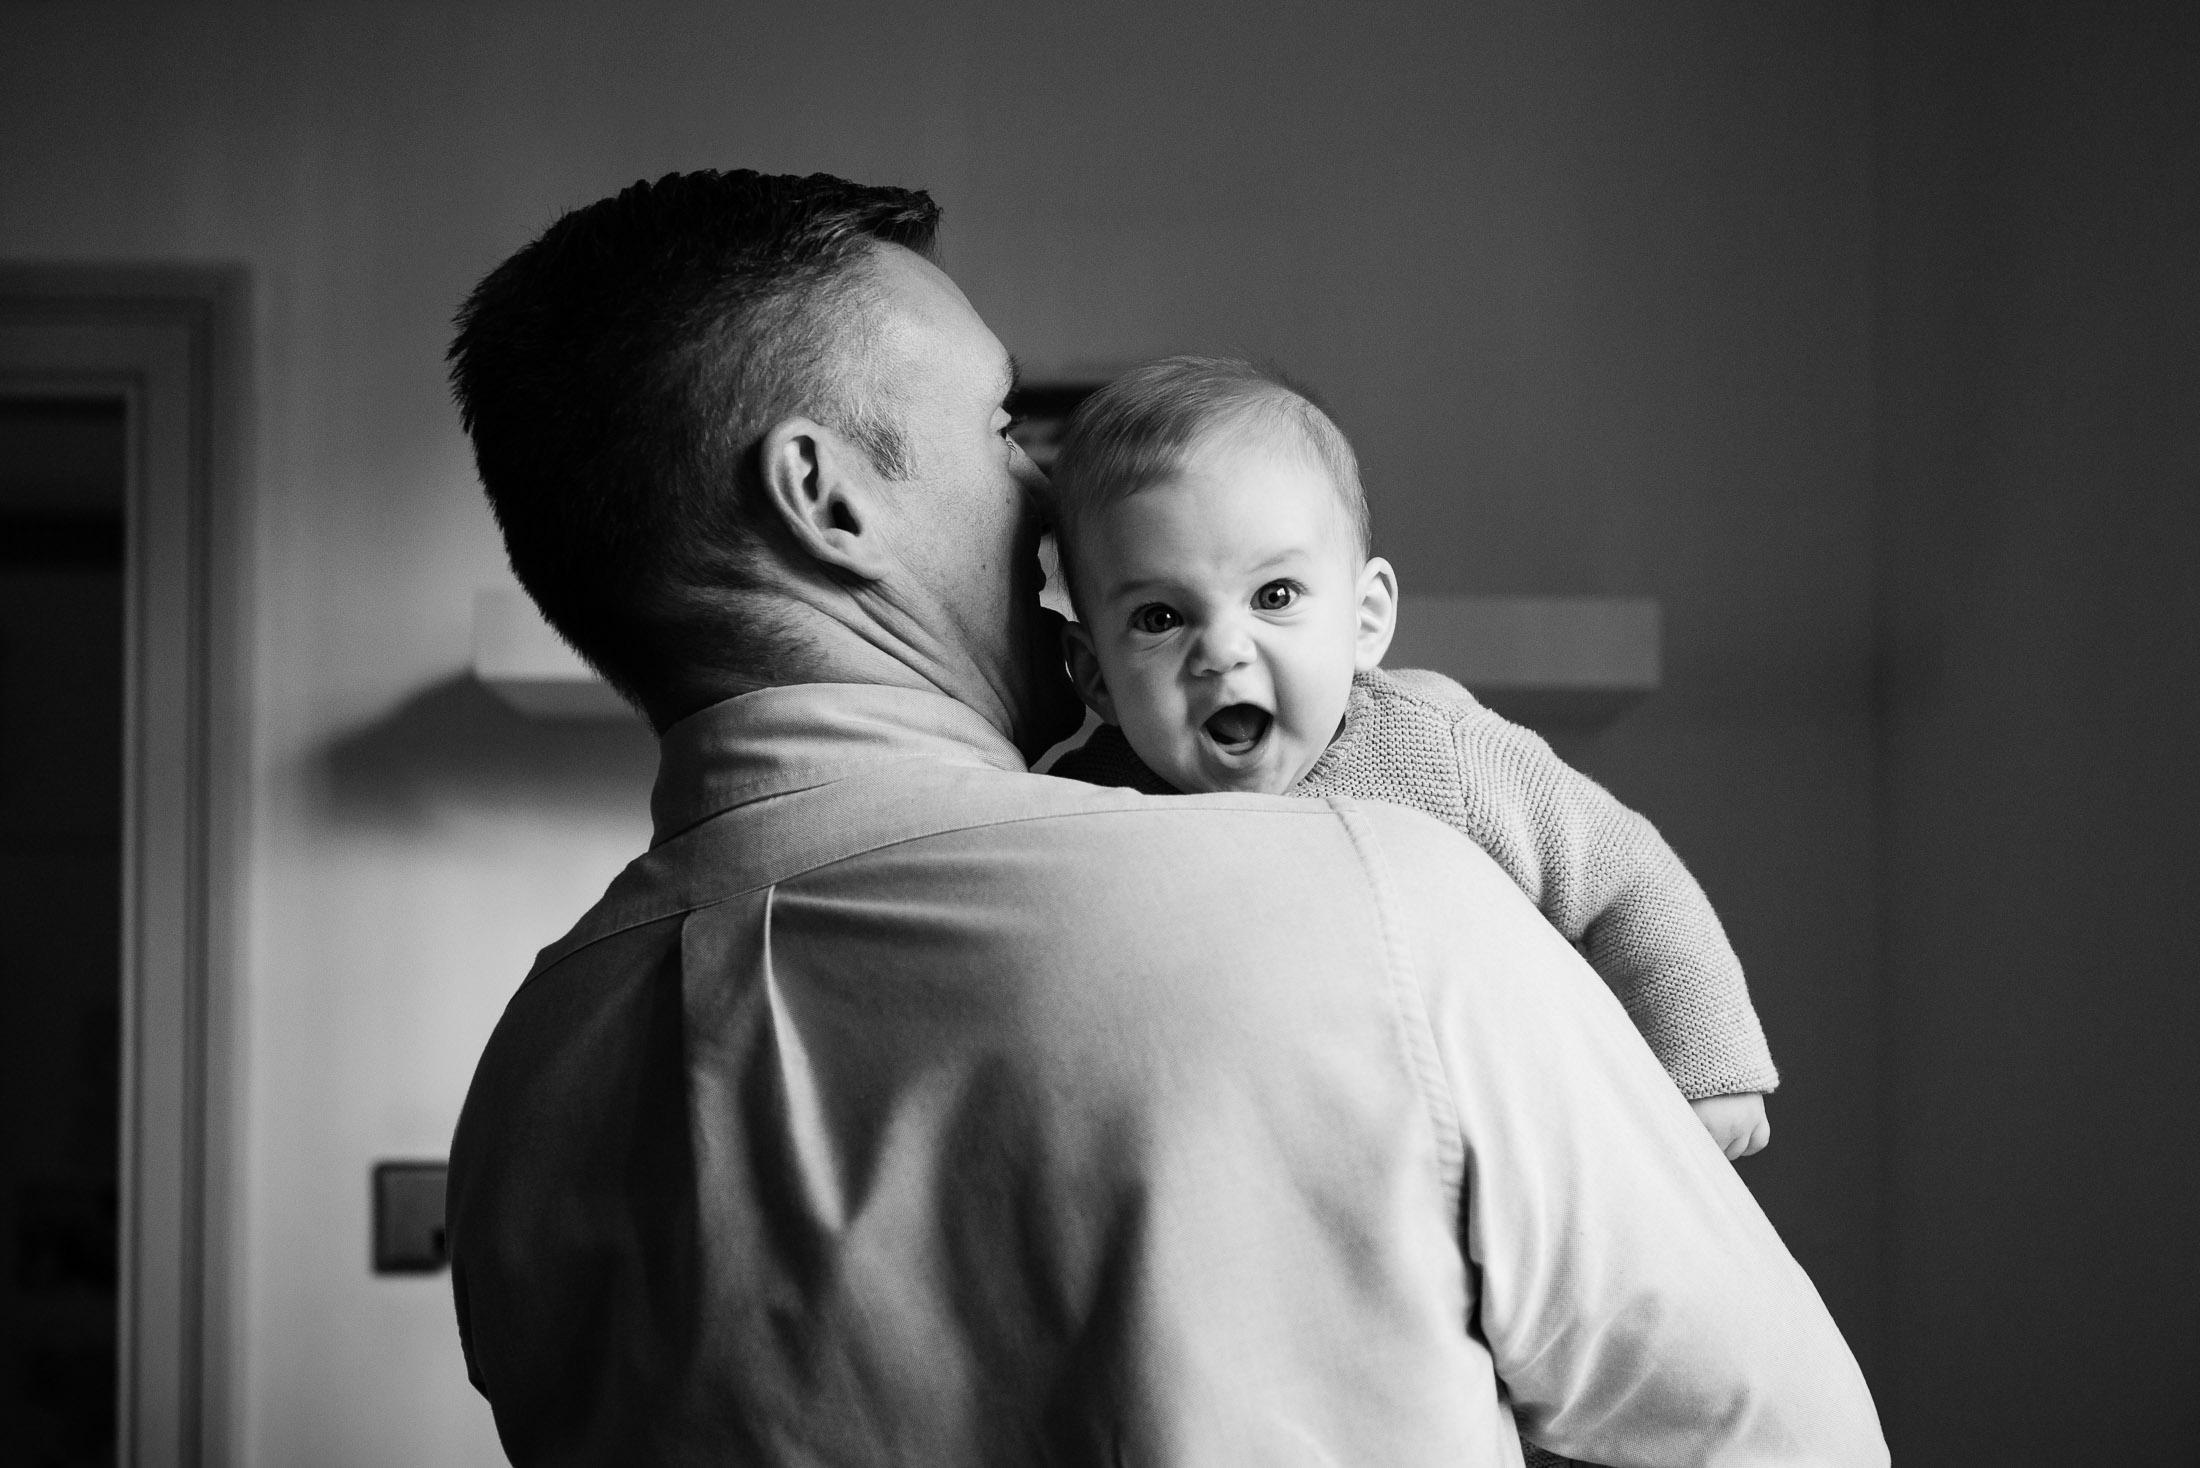 childrens-photography-london--2.jpg